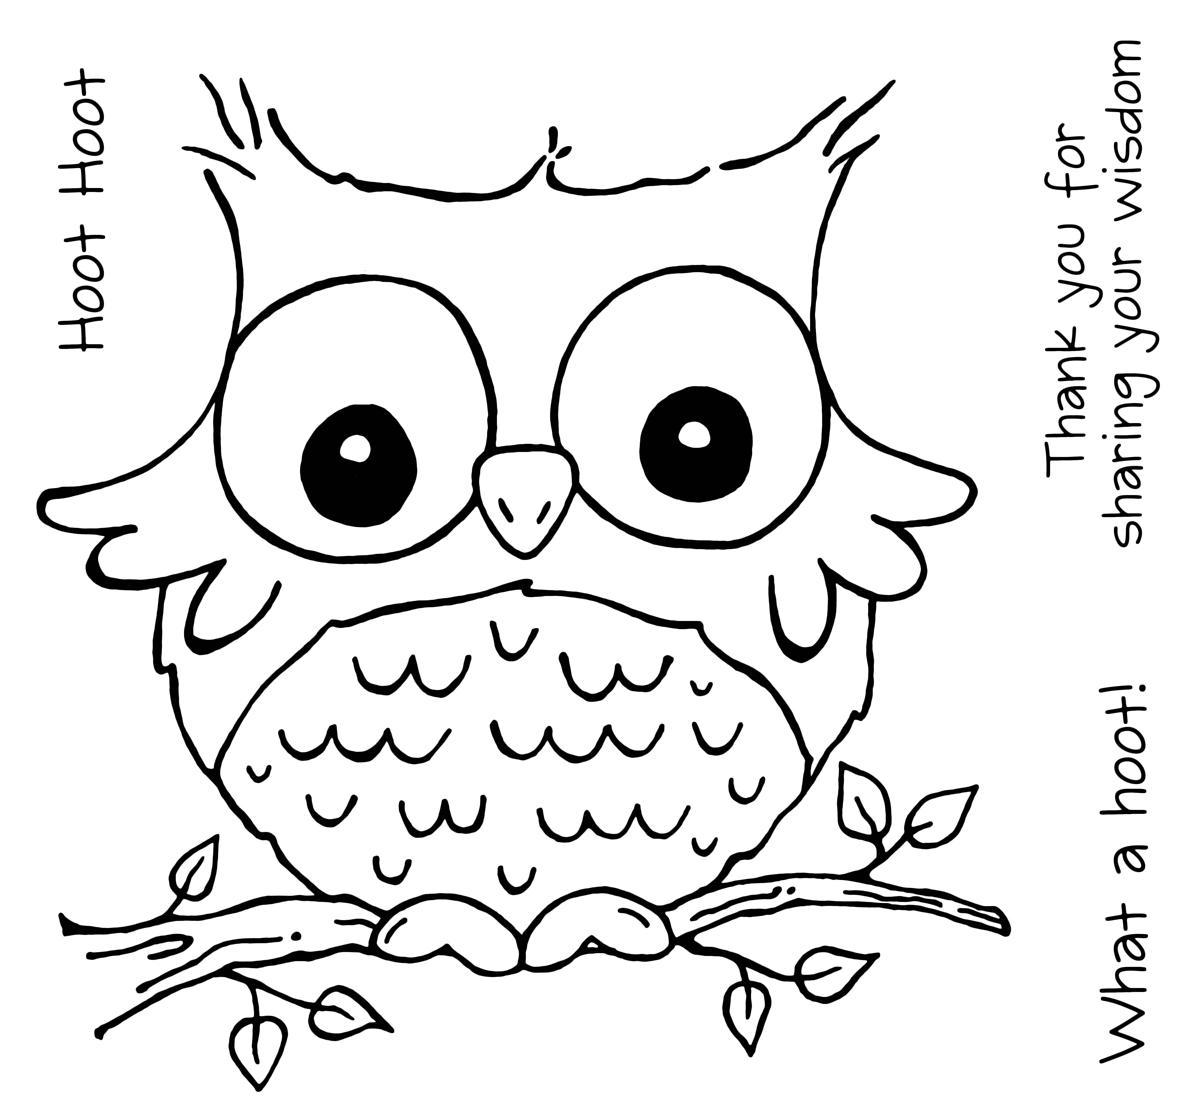 7 Best Images of Cute Paper Owl Printable Coloring - Cute ...